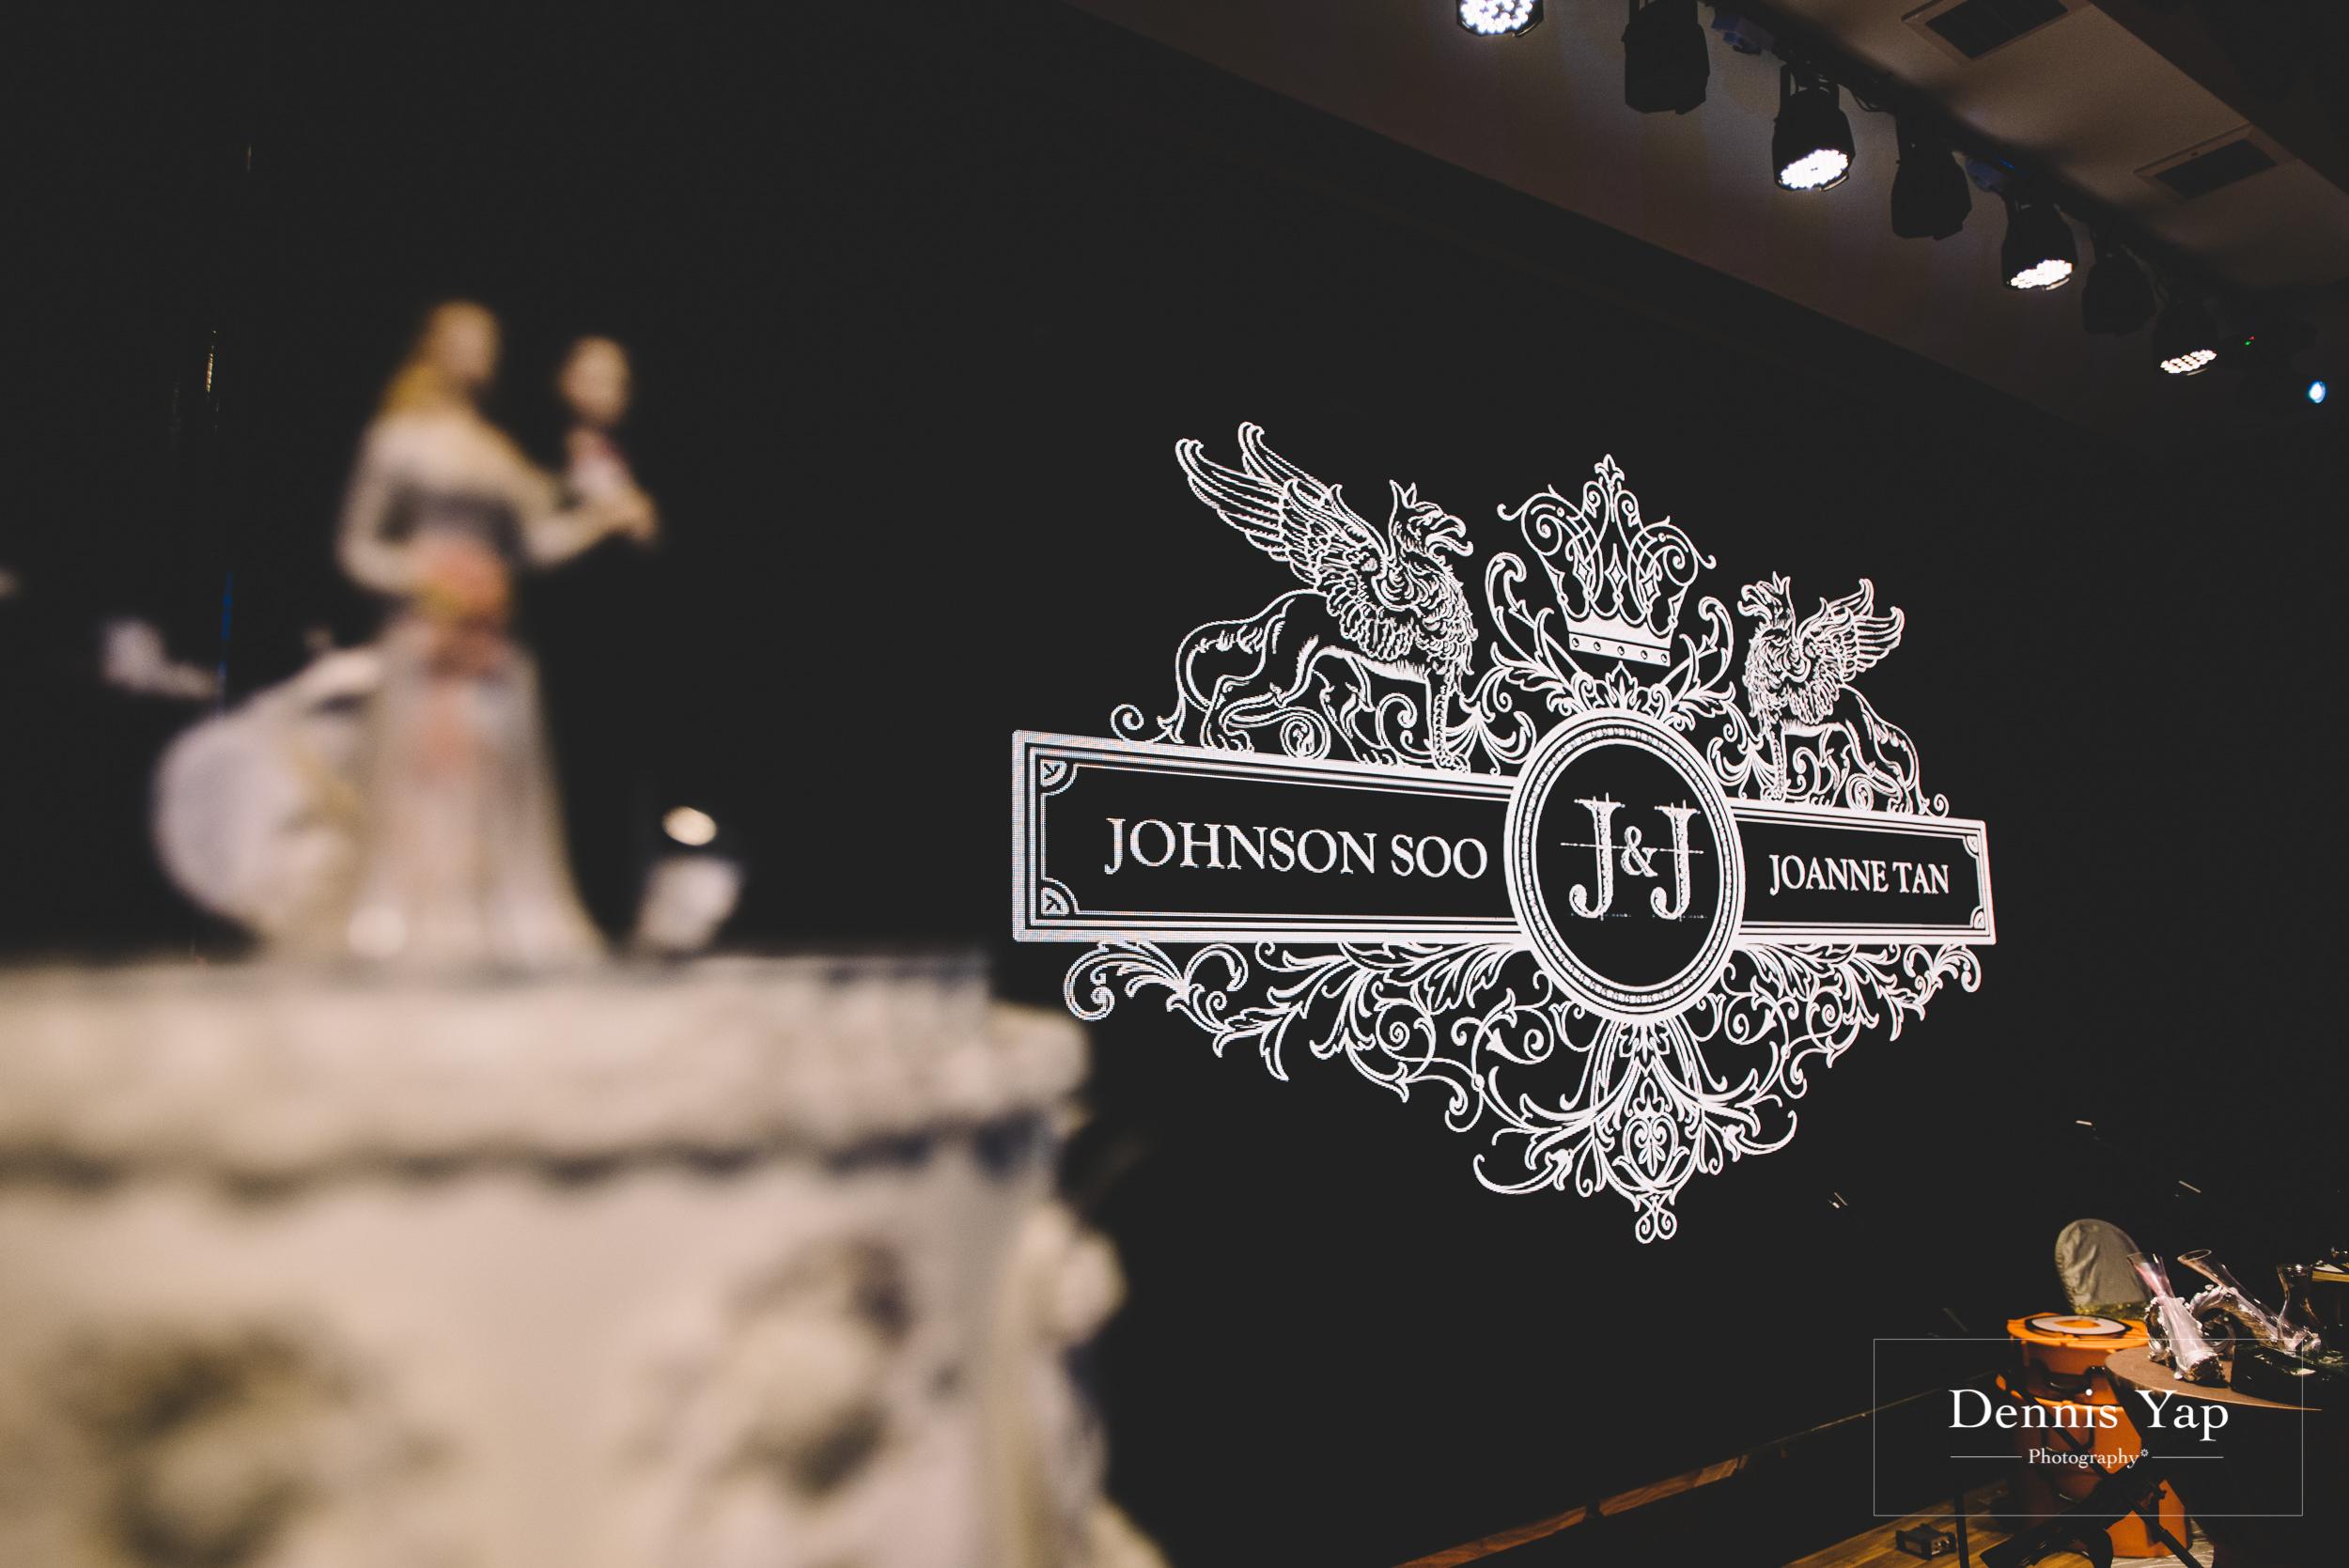 johnson joanne wedding dinner klang centro malaysia wedding photographer dennis yap-1.jpg